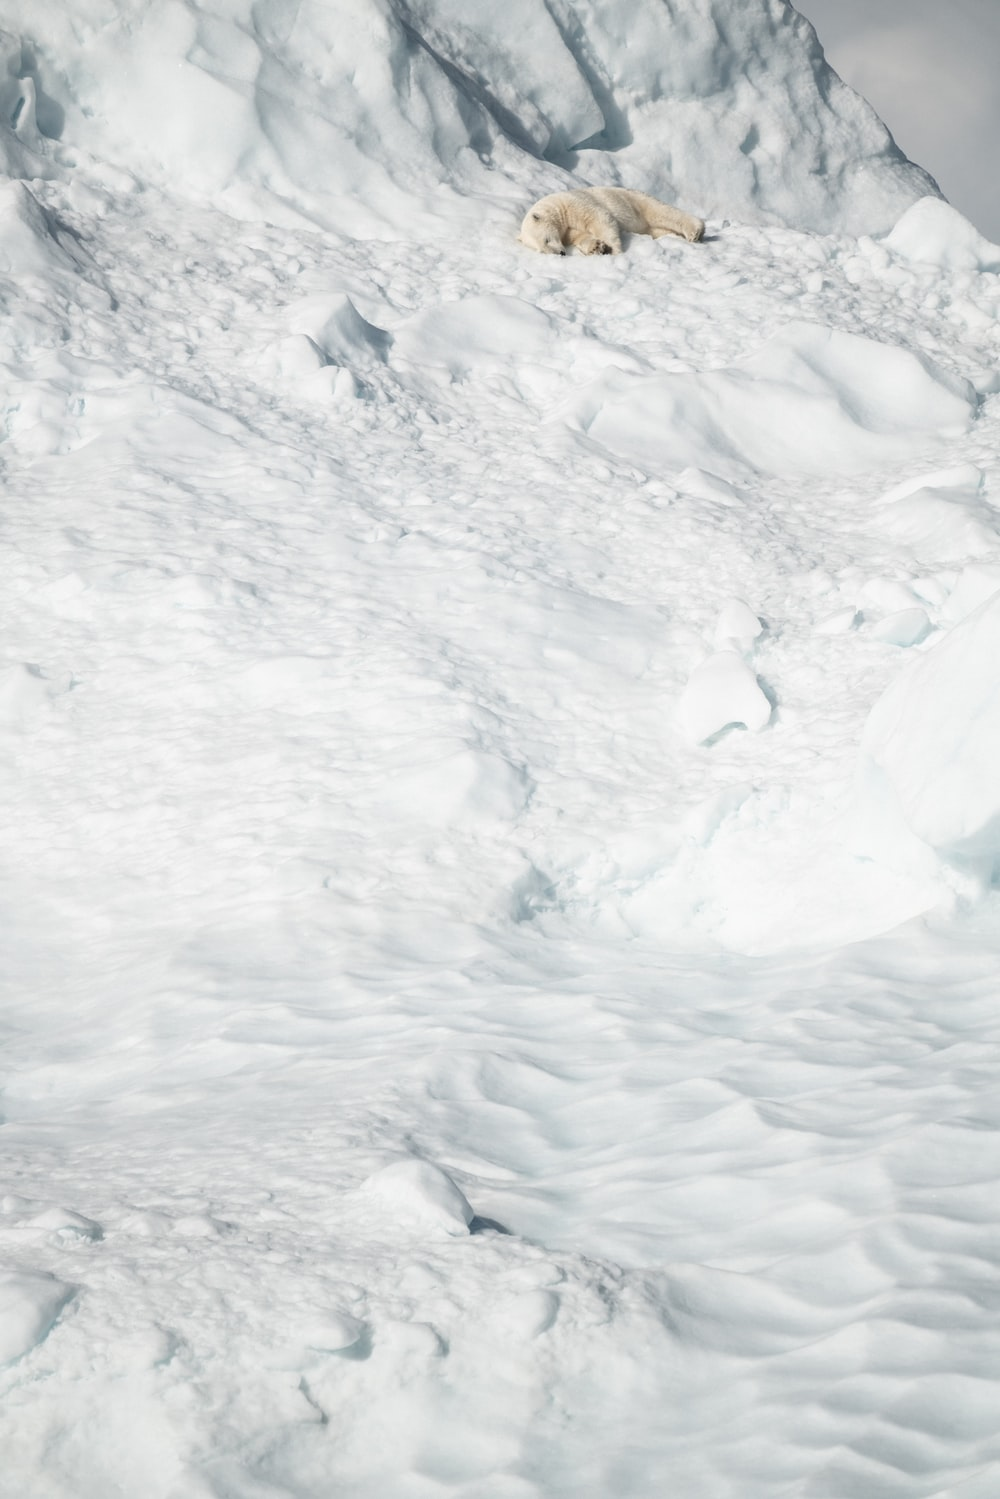 polar bear lying on snow